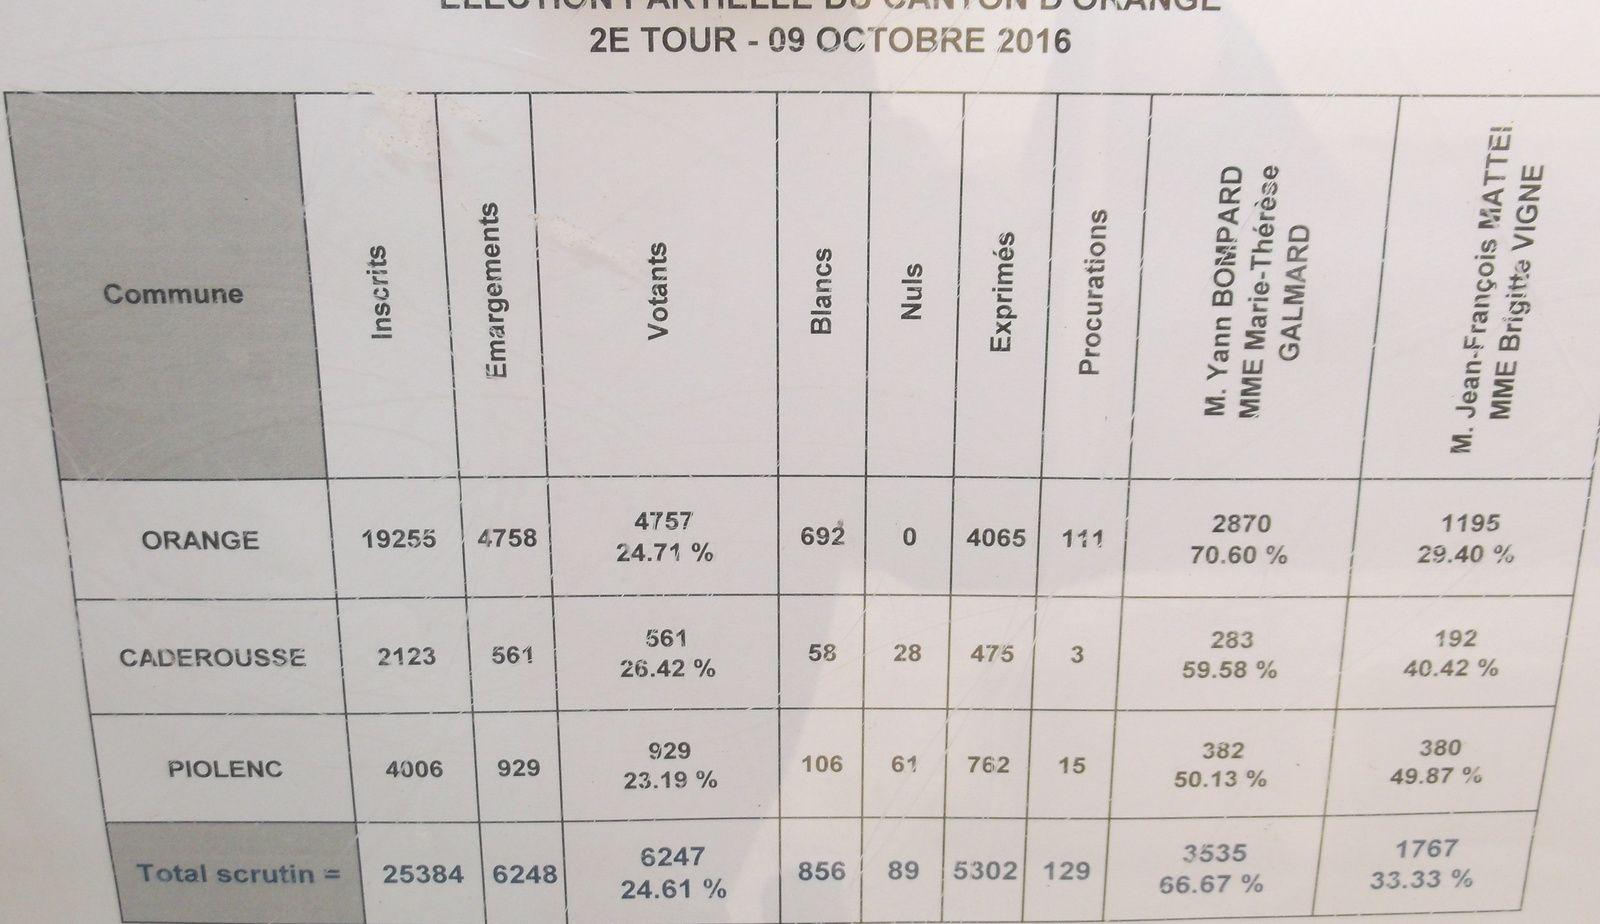 Cantonales 2015/2016&#x3B; d'un scrutin à l'autre.